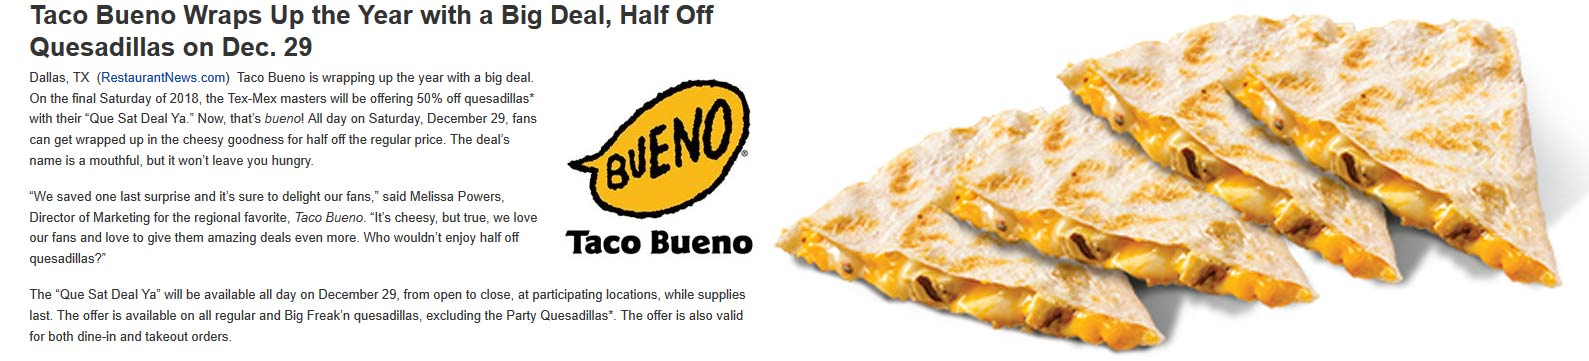 Taco Bueno Coupon July 2020 50% off quesadillas today at Taco Bueno restaurants